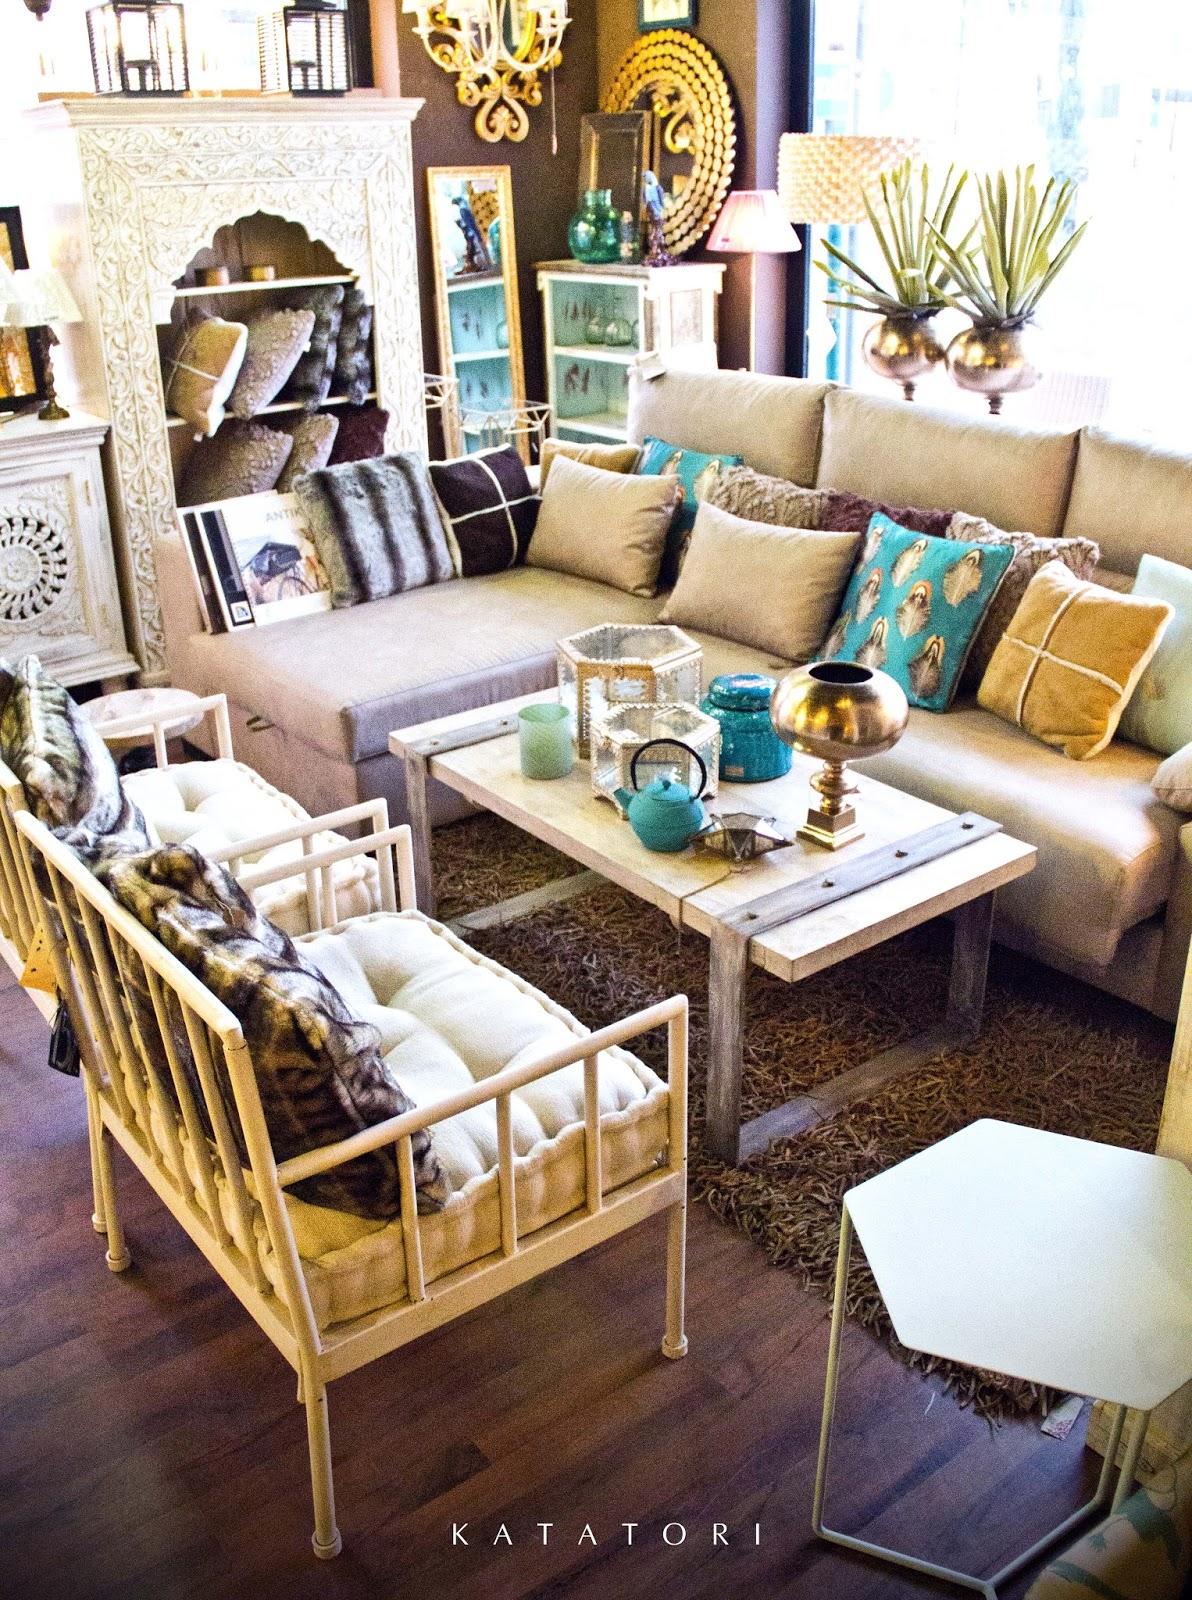 Katatori interiores tonos neutros for Muebles quivir en sevilla